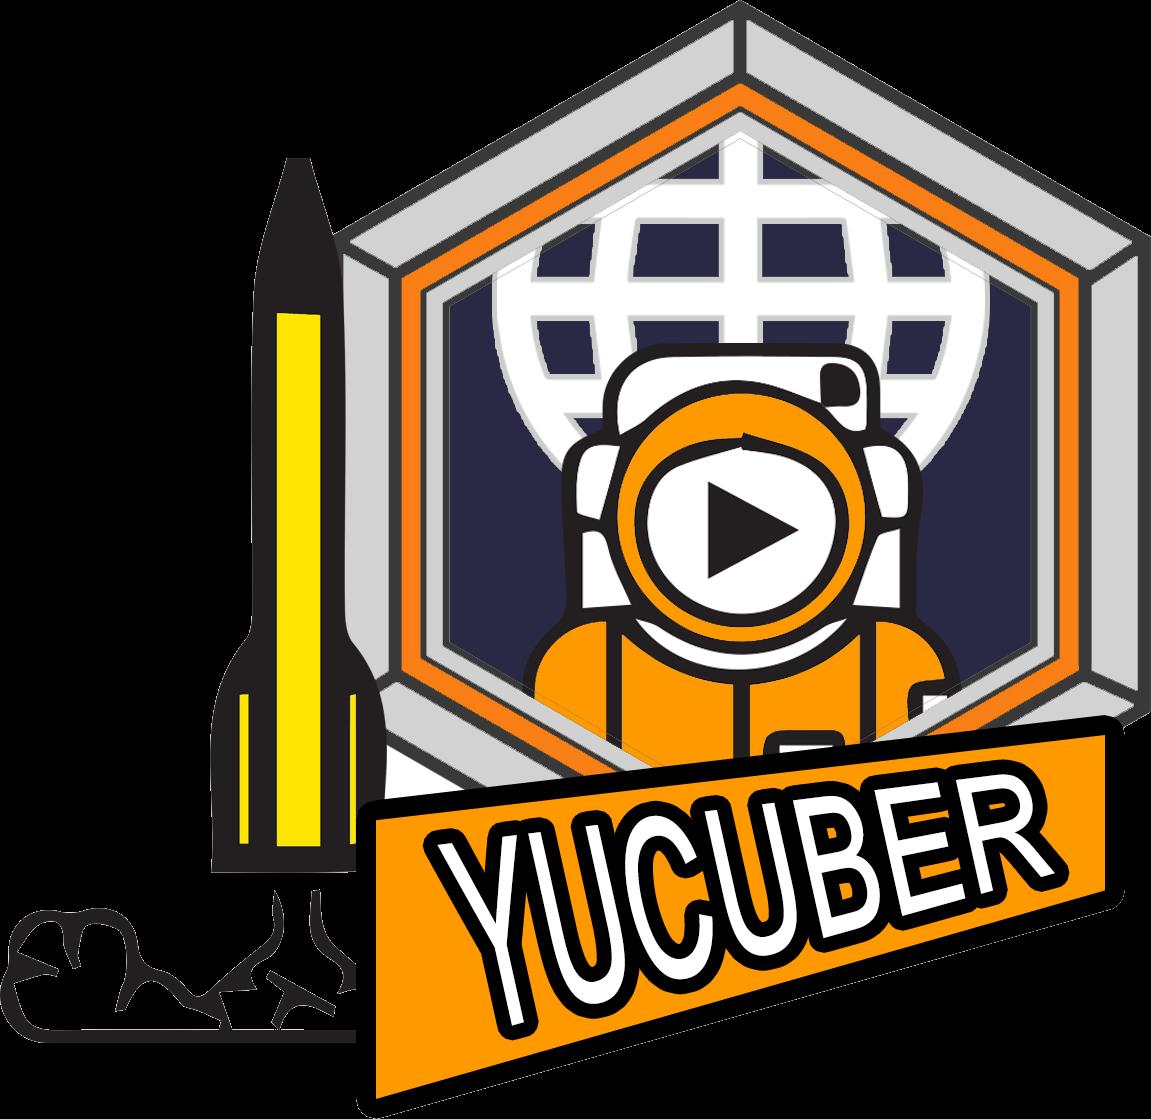 Yucuber